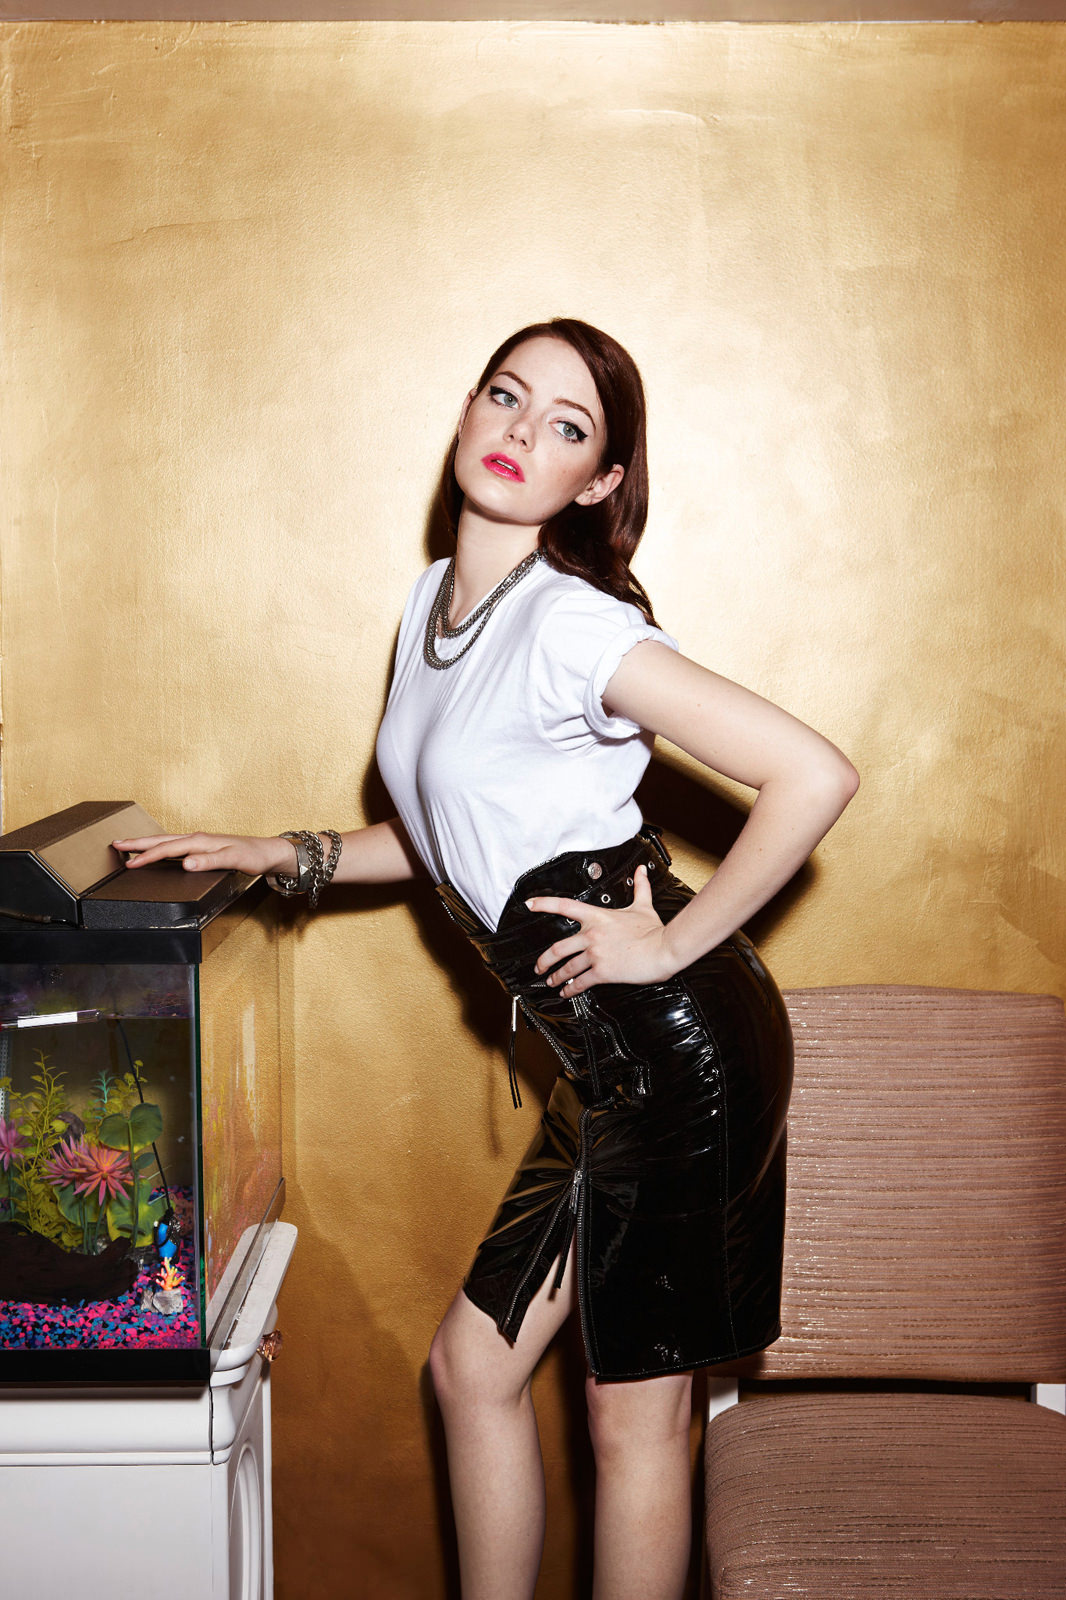 Emma Stone Photo Gallery